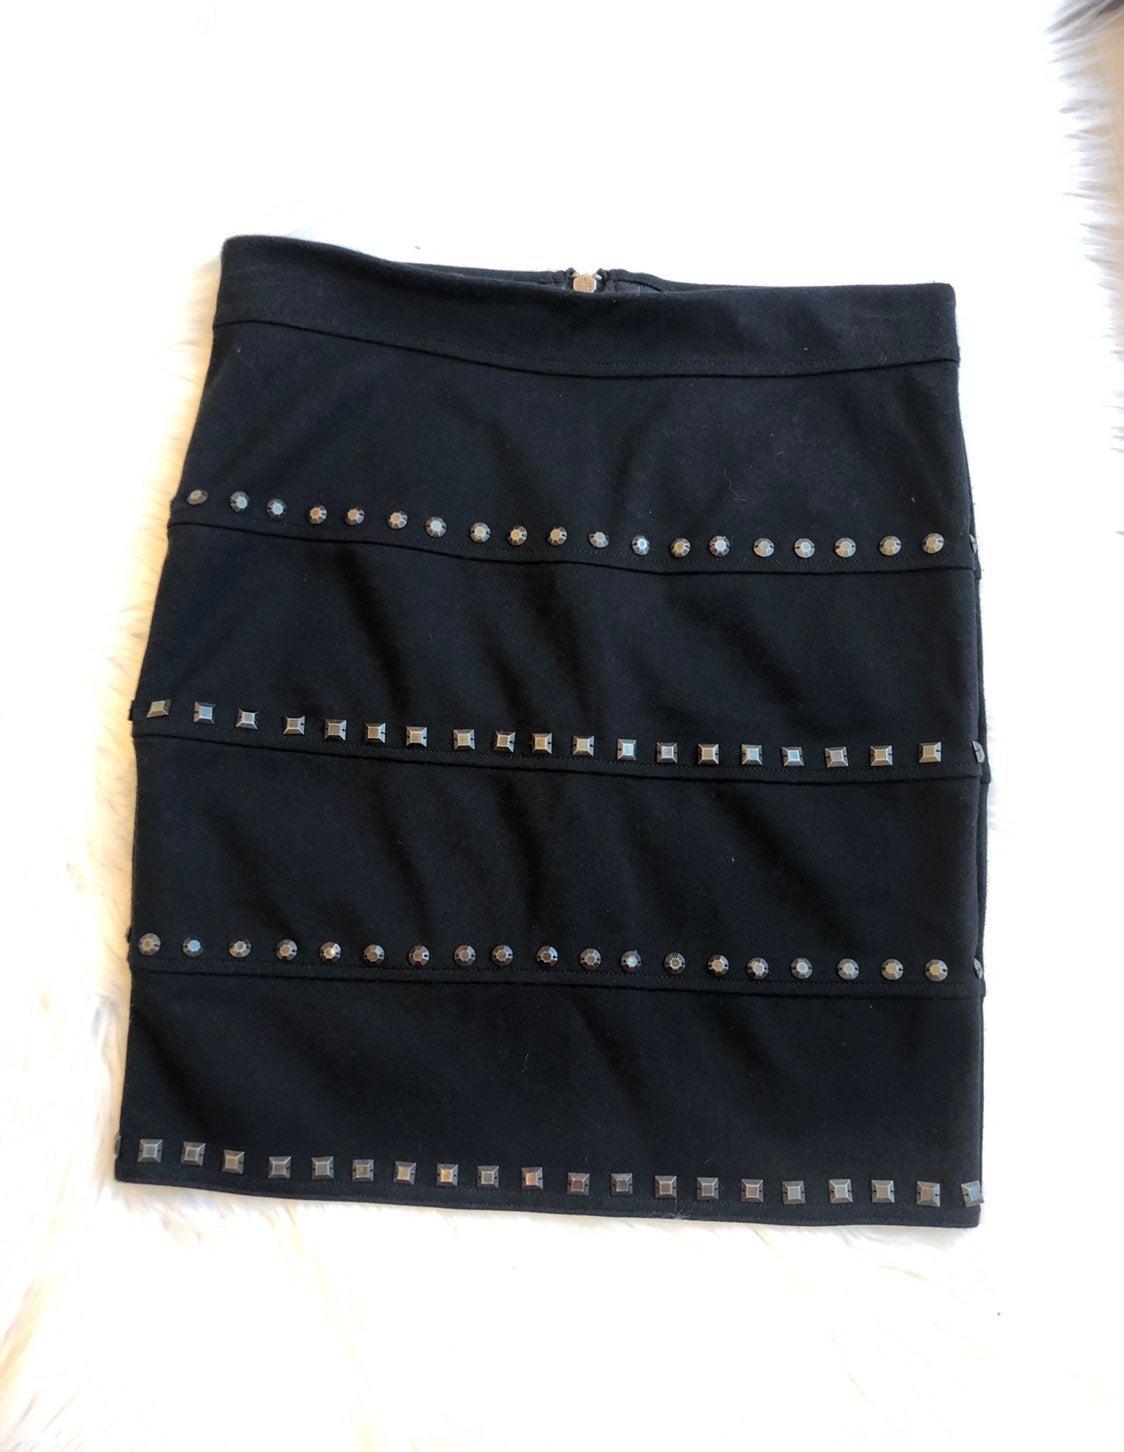 NWOT Candie's Studded Black Skirt